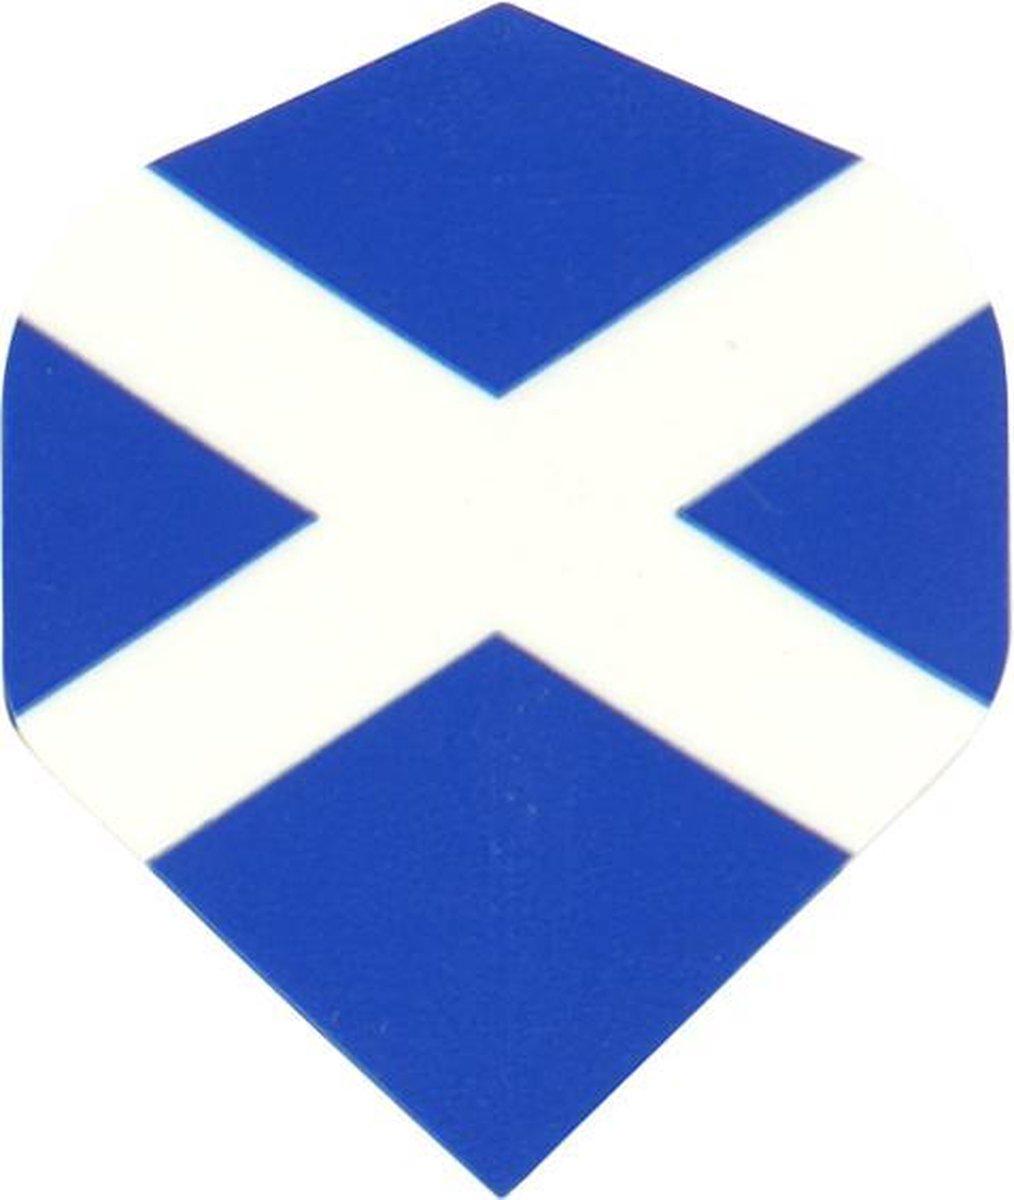 McKick's - Metronic - Schotland - Dartflight